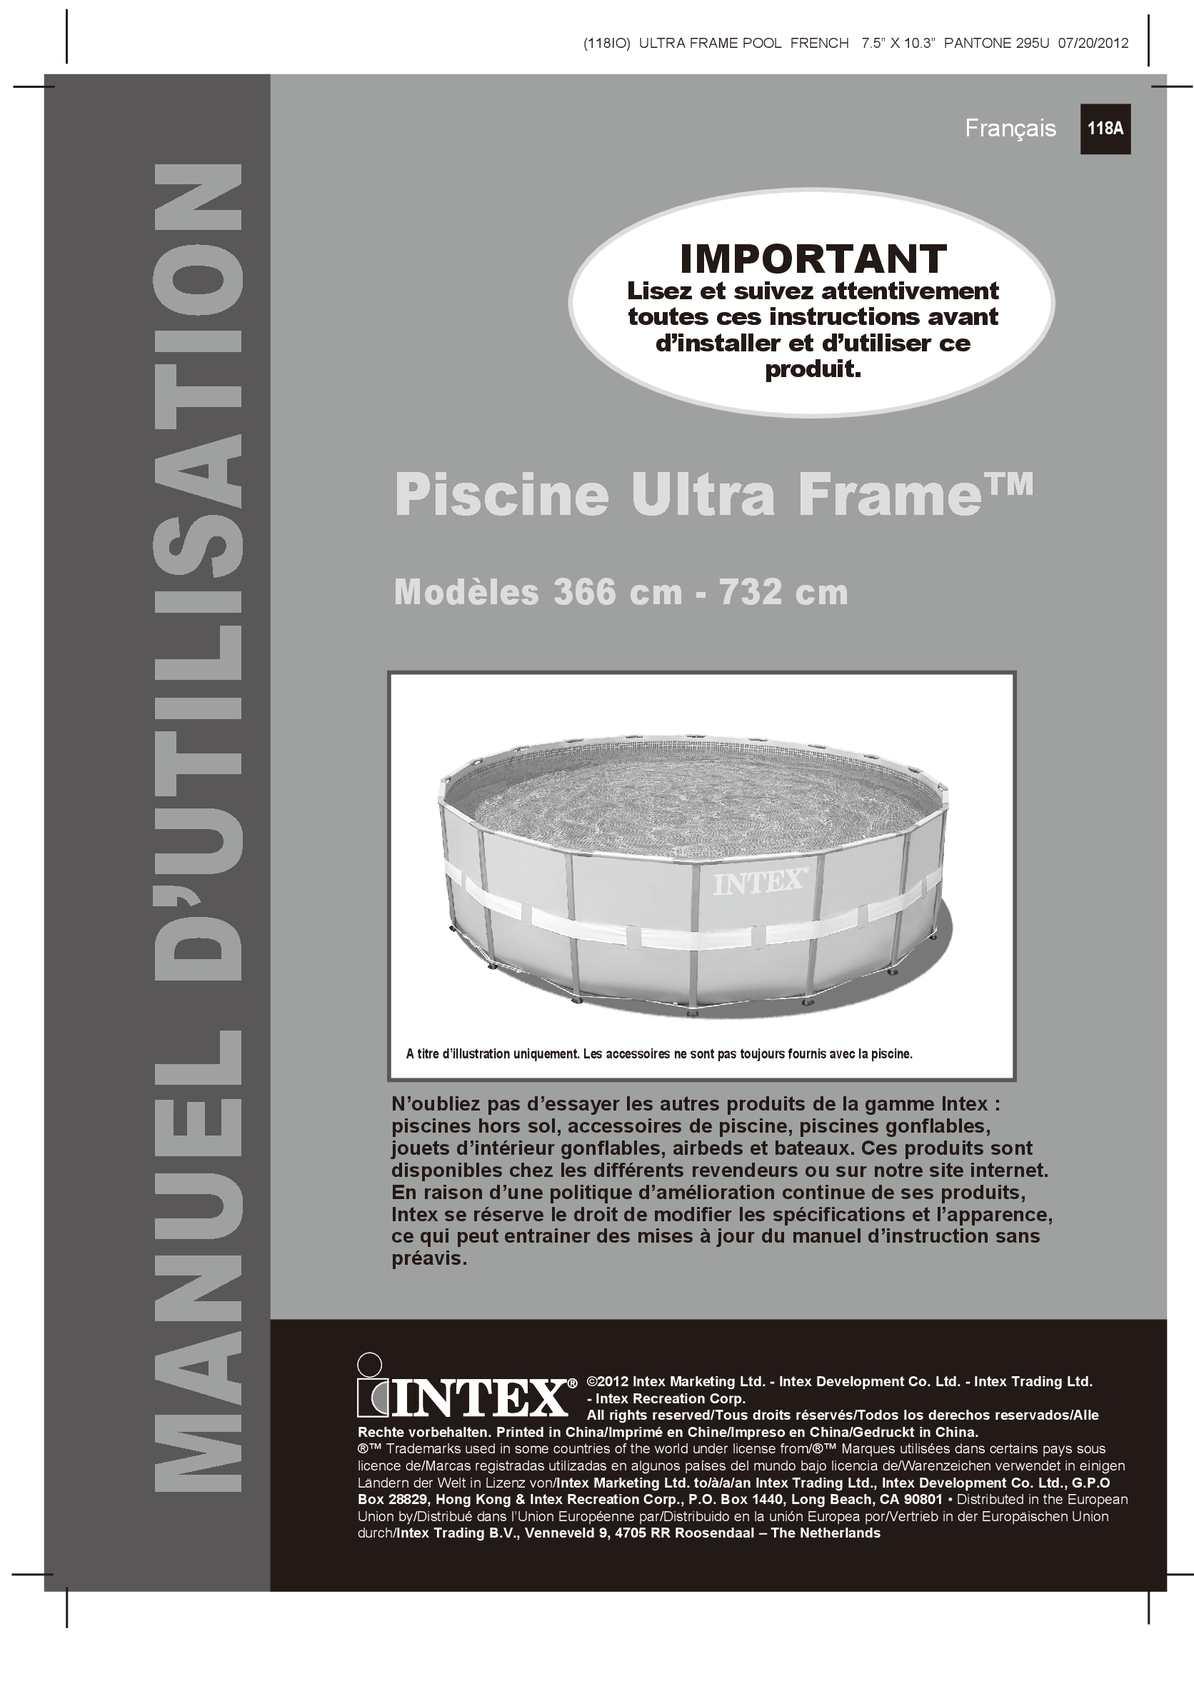 intex ultra frame pool instructions